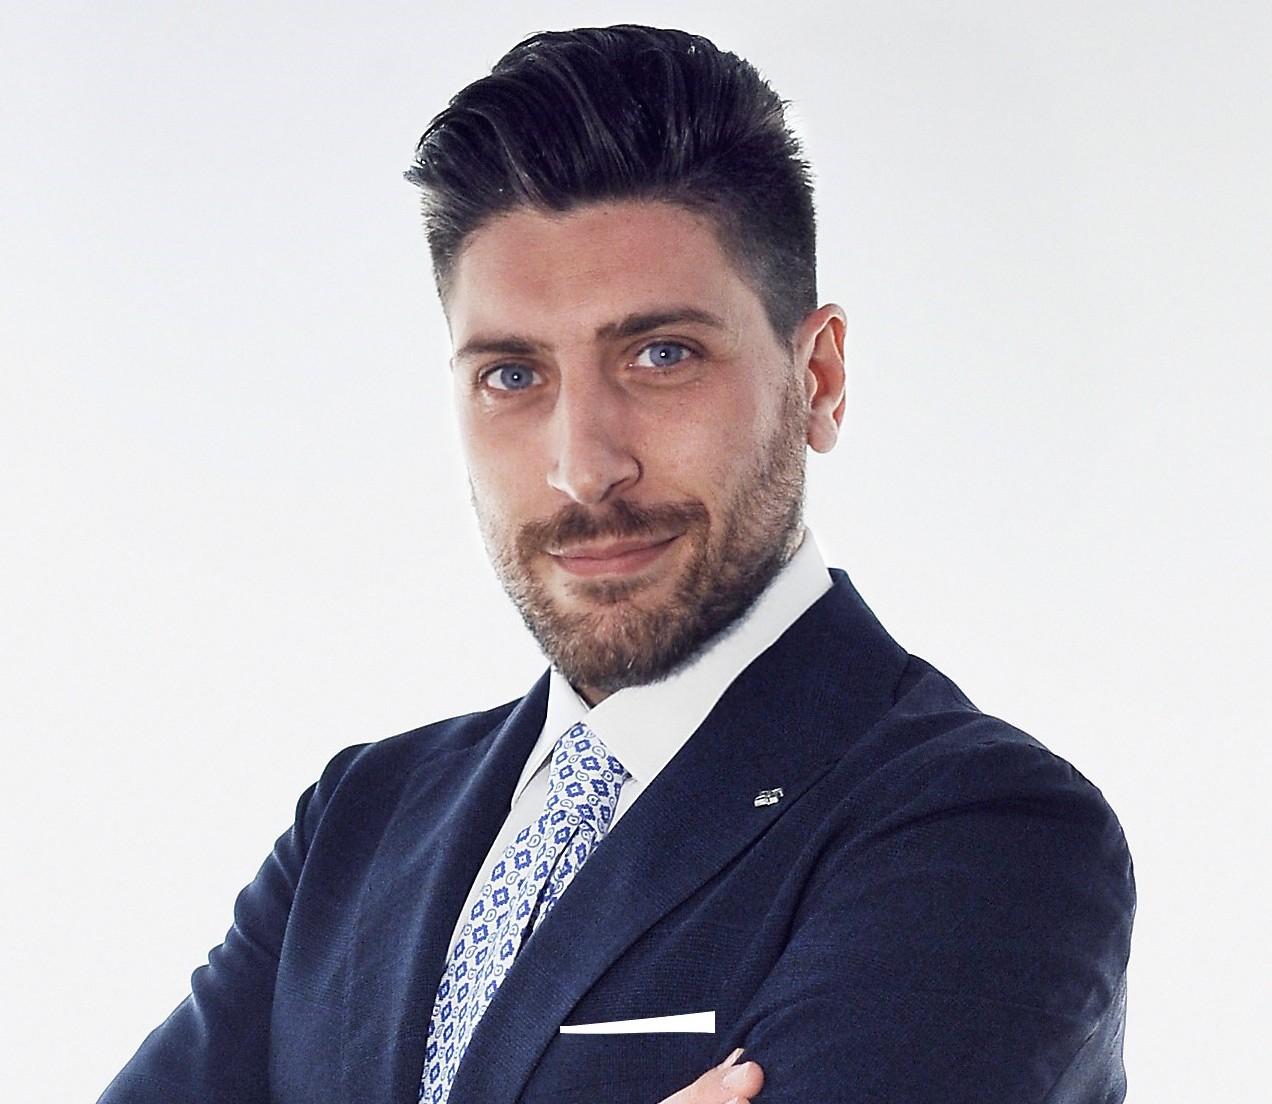 Luca Ruggieri